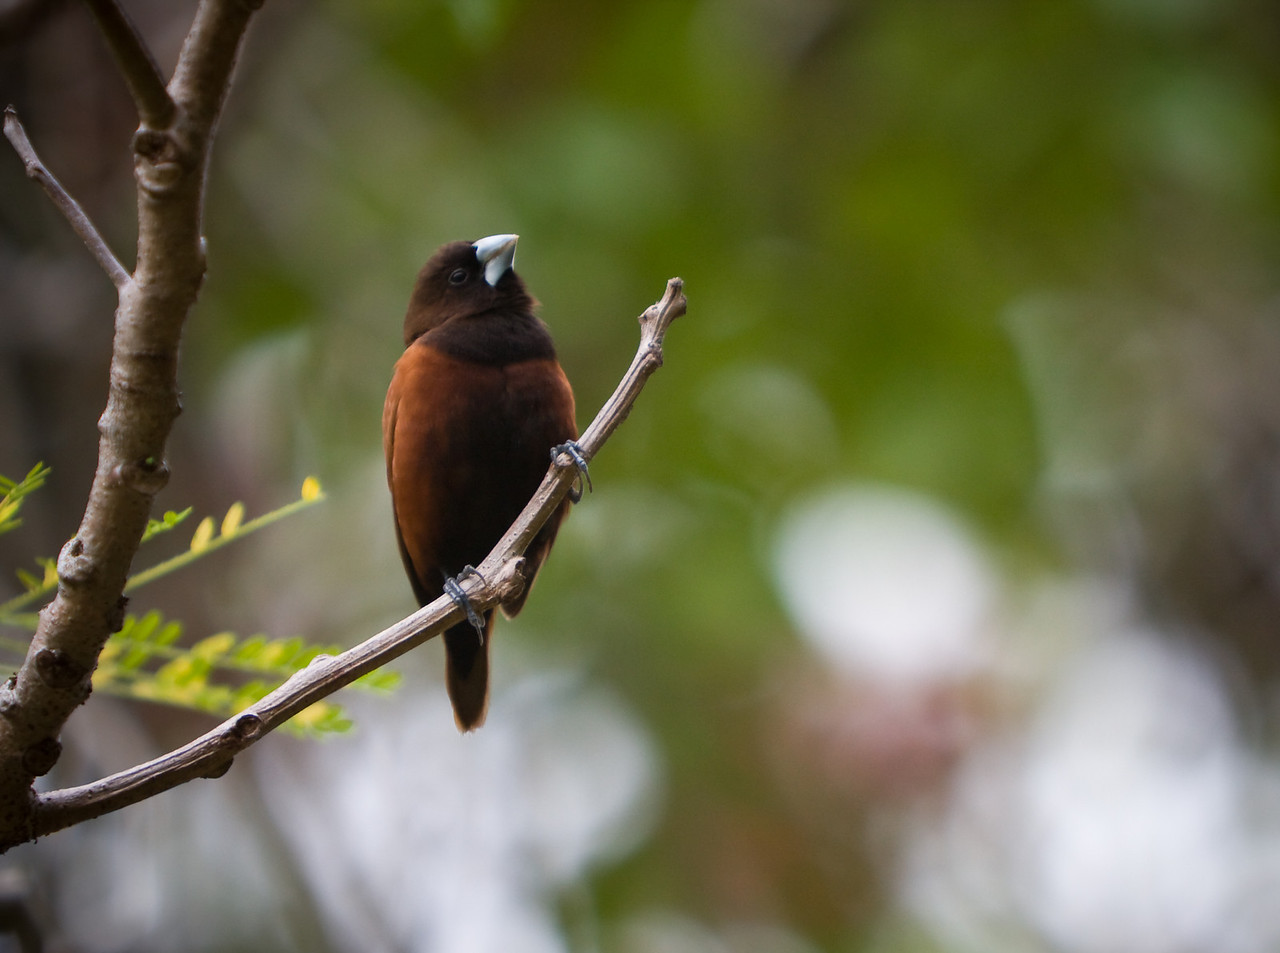 Black-Headed Munia (Lonchura atricapilla).